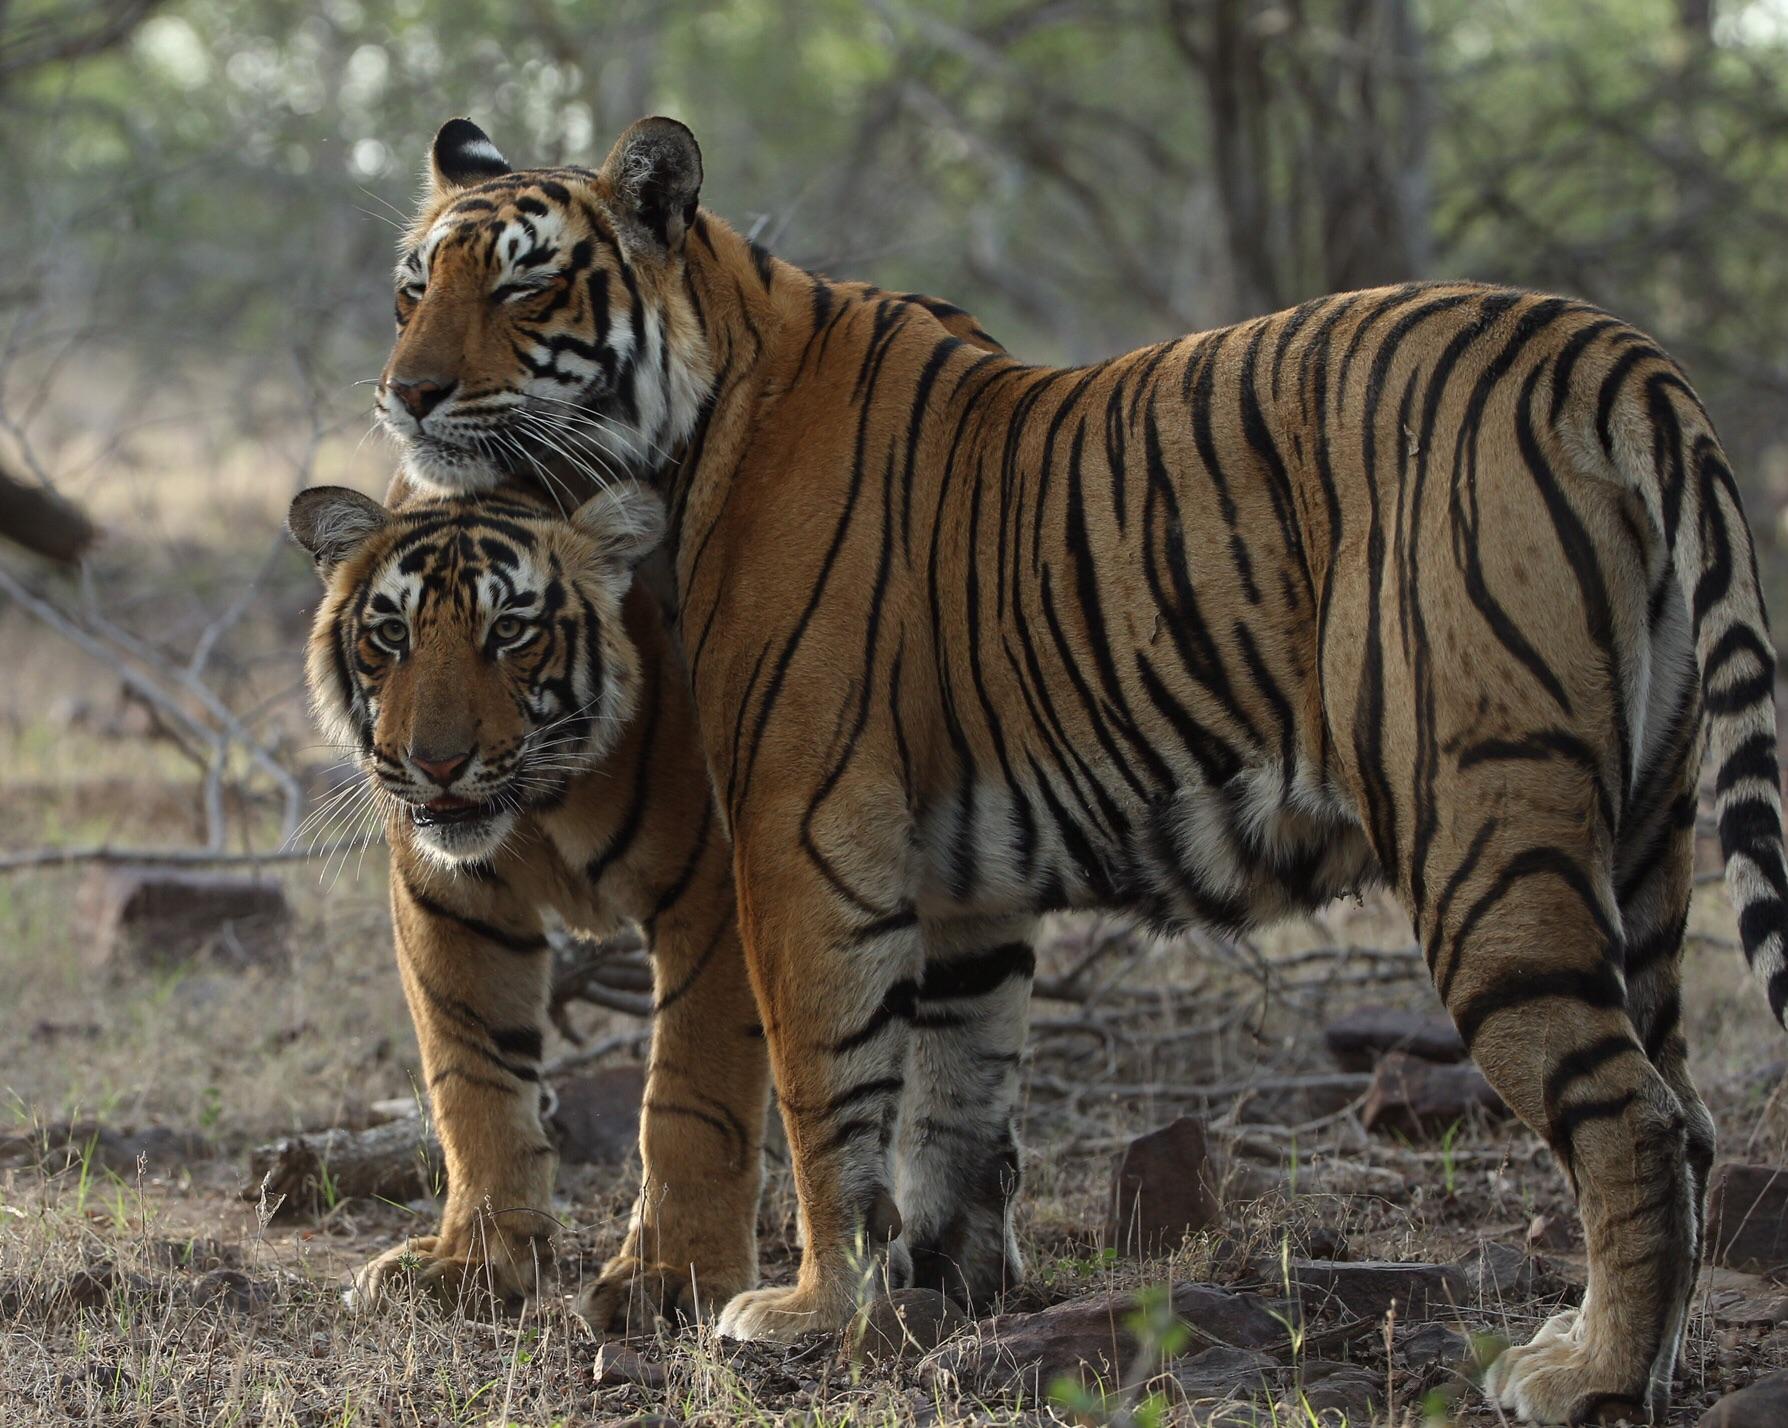 Mum and cub